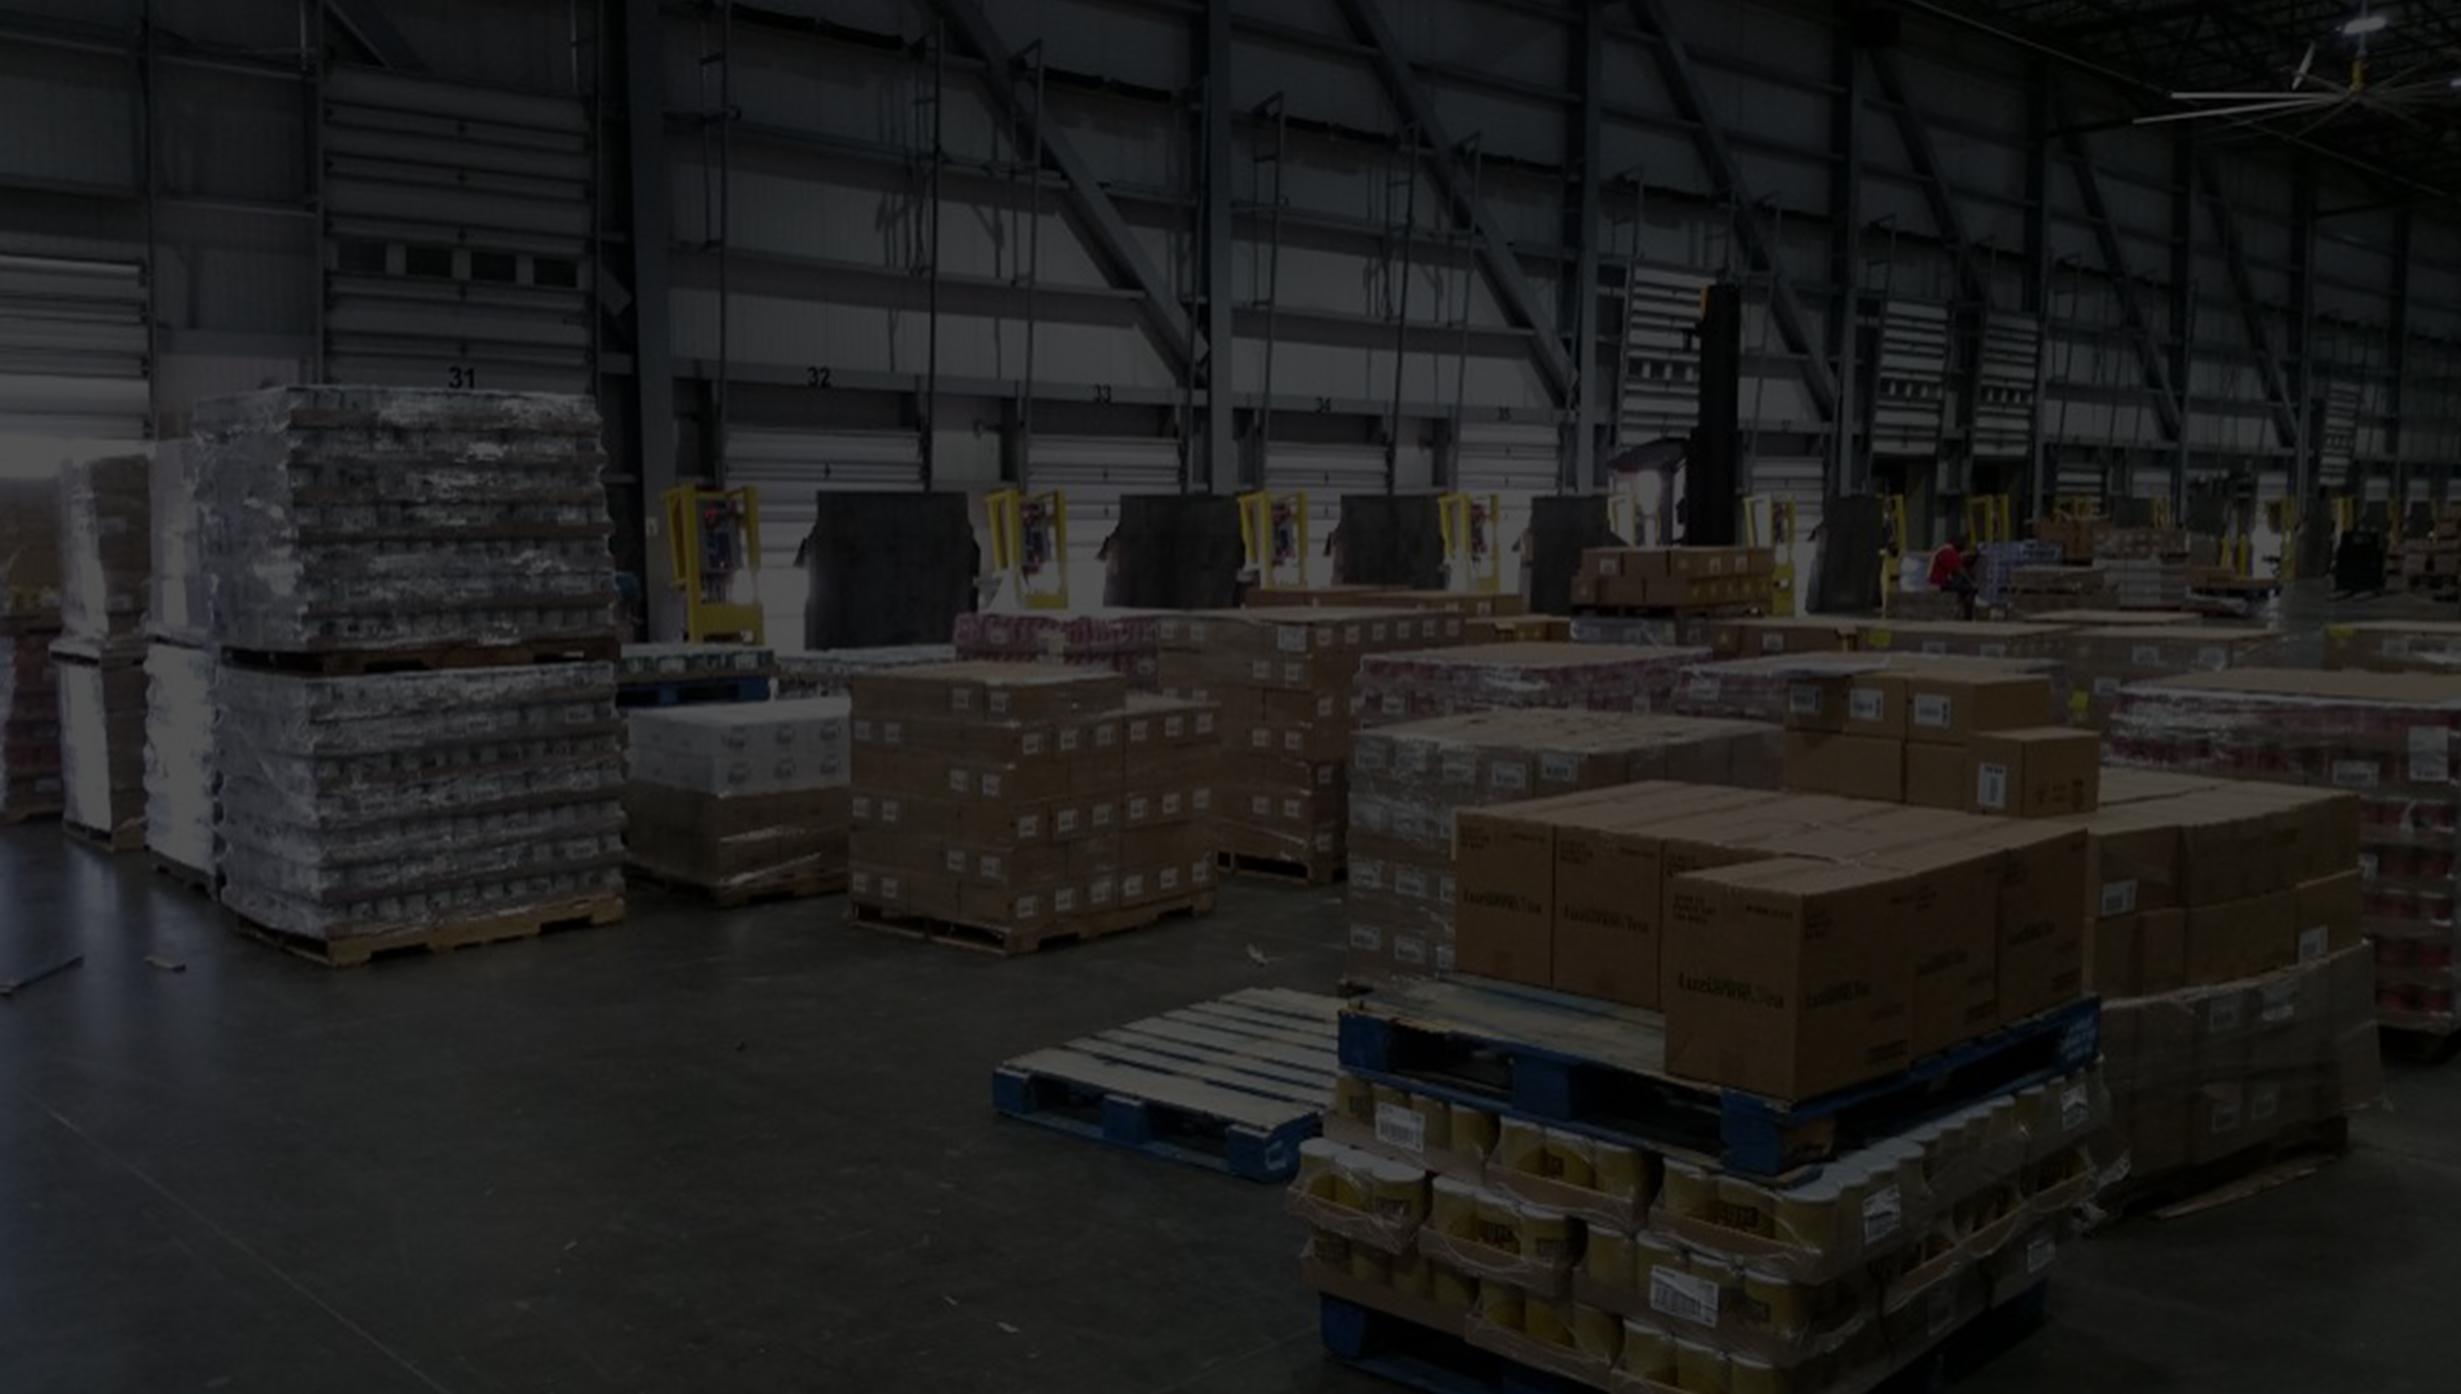 Gremiken-Investments---Procurement-and-Logistics-Services-in-Kenya